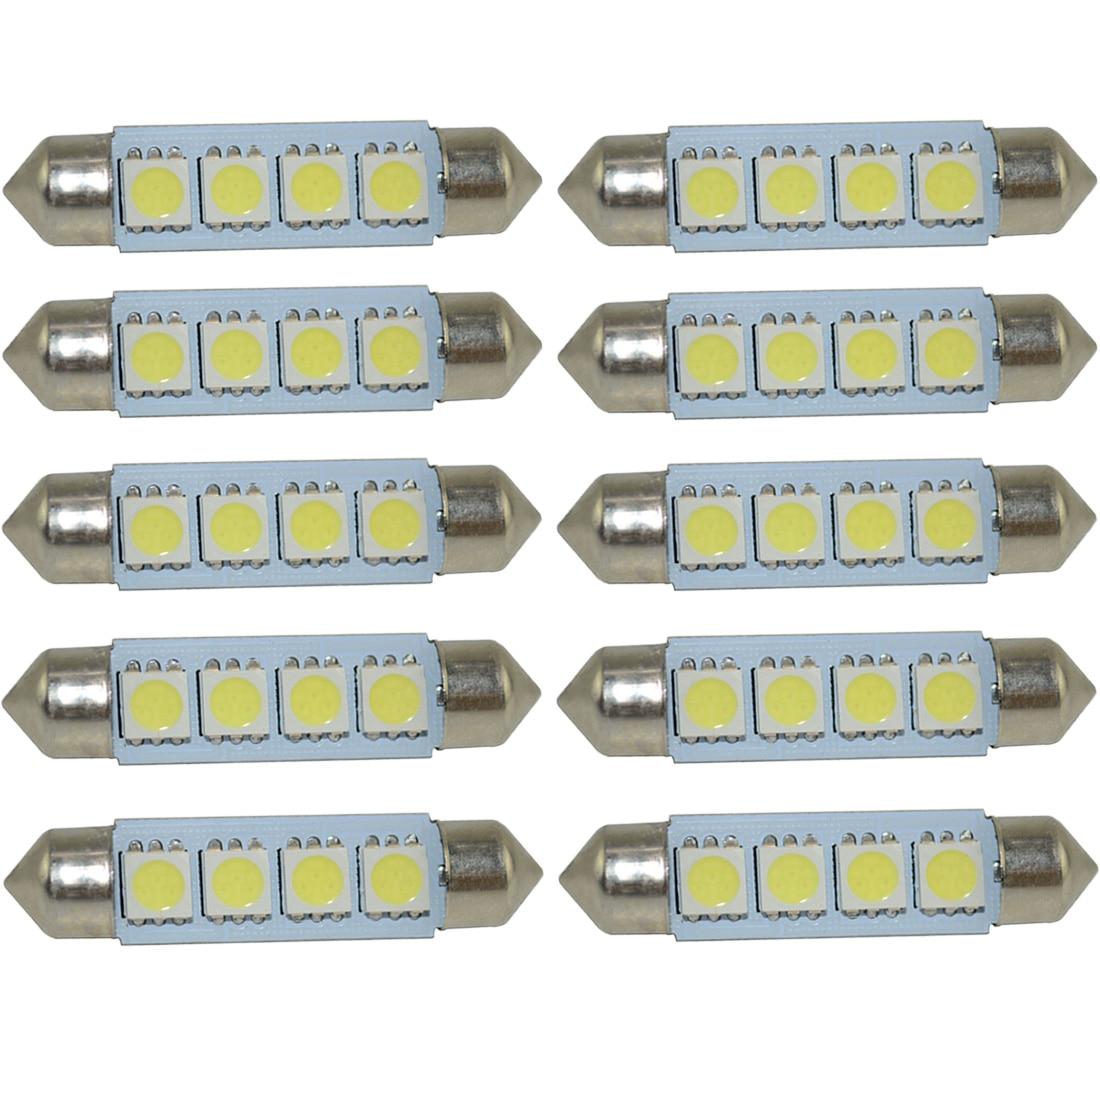 Safego 10pcs Festoon <font><b>LED</b></font> C5W 31mm <font><b>42mm</b></font> <font><b>LED</b></font> dome Bulbs 4 SMD 5050 Car interior Lights Auto License Plate Light Lamp 12V White